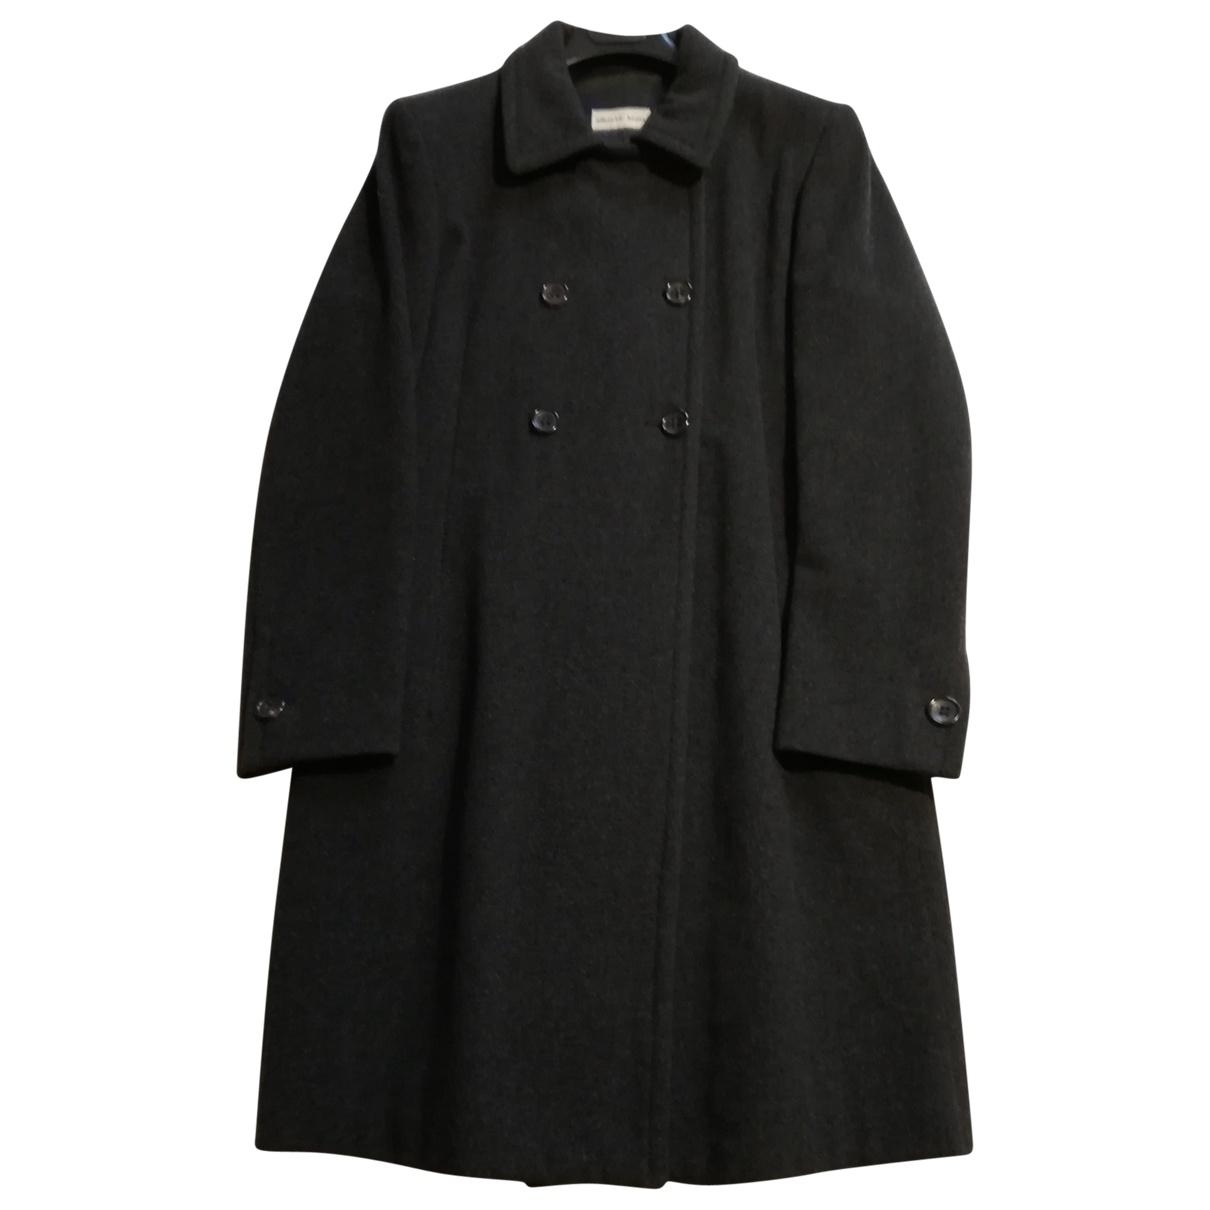 Alberto Biani \N Anthracite Wool coat for Women 42 IT